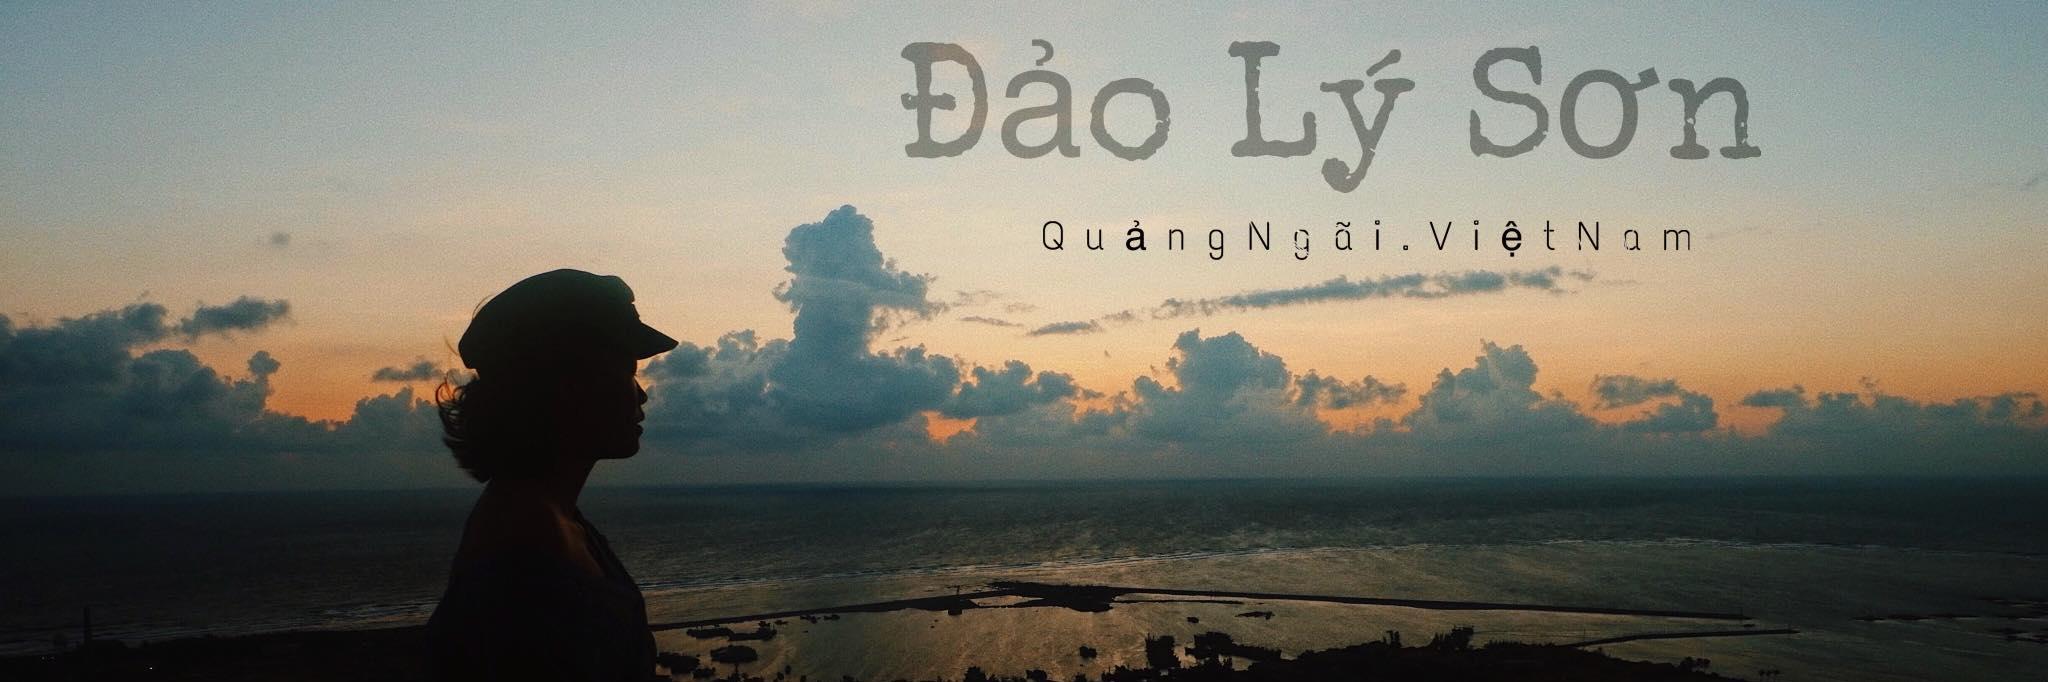 https://gody.vn/blog/hazeline956496/post/tim-ve-dao-tien-ly-son-hoang-so-hoa-binh-yen-6872